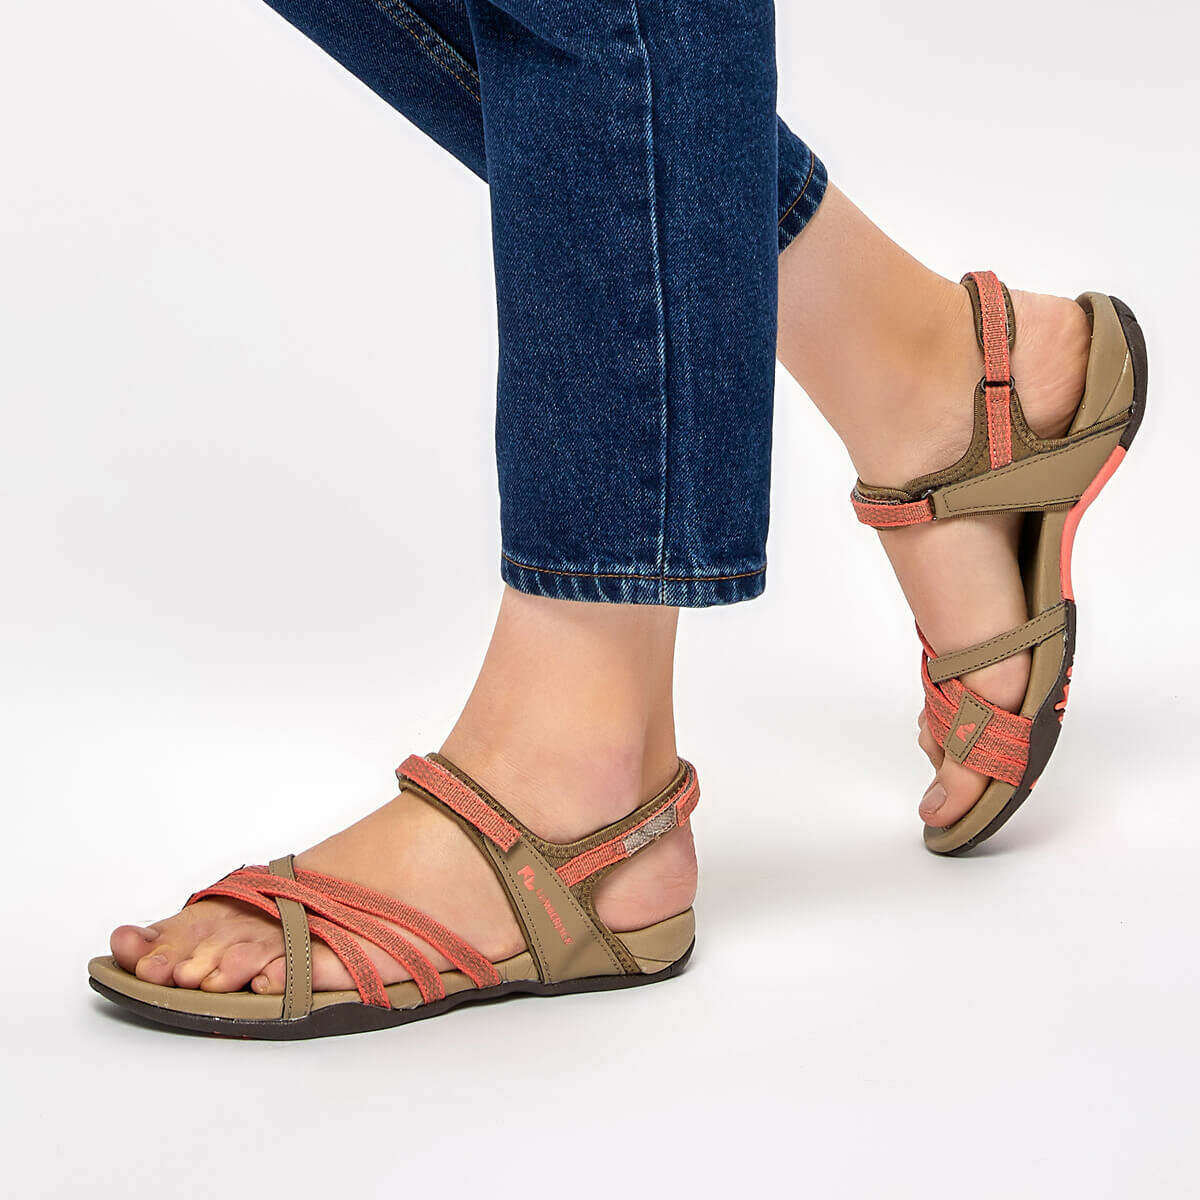 FLO EFTAL Burgundy Women 'S Sandals LUMBERJACK